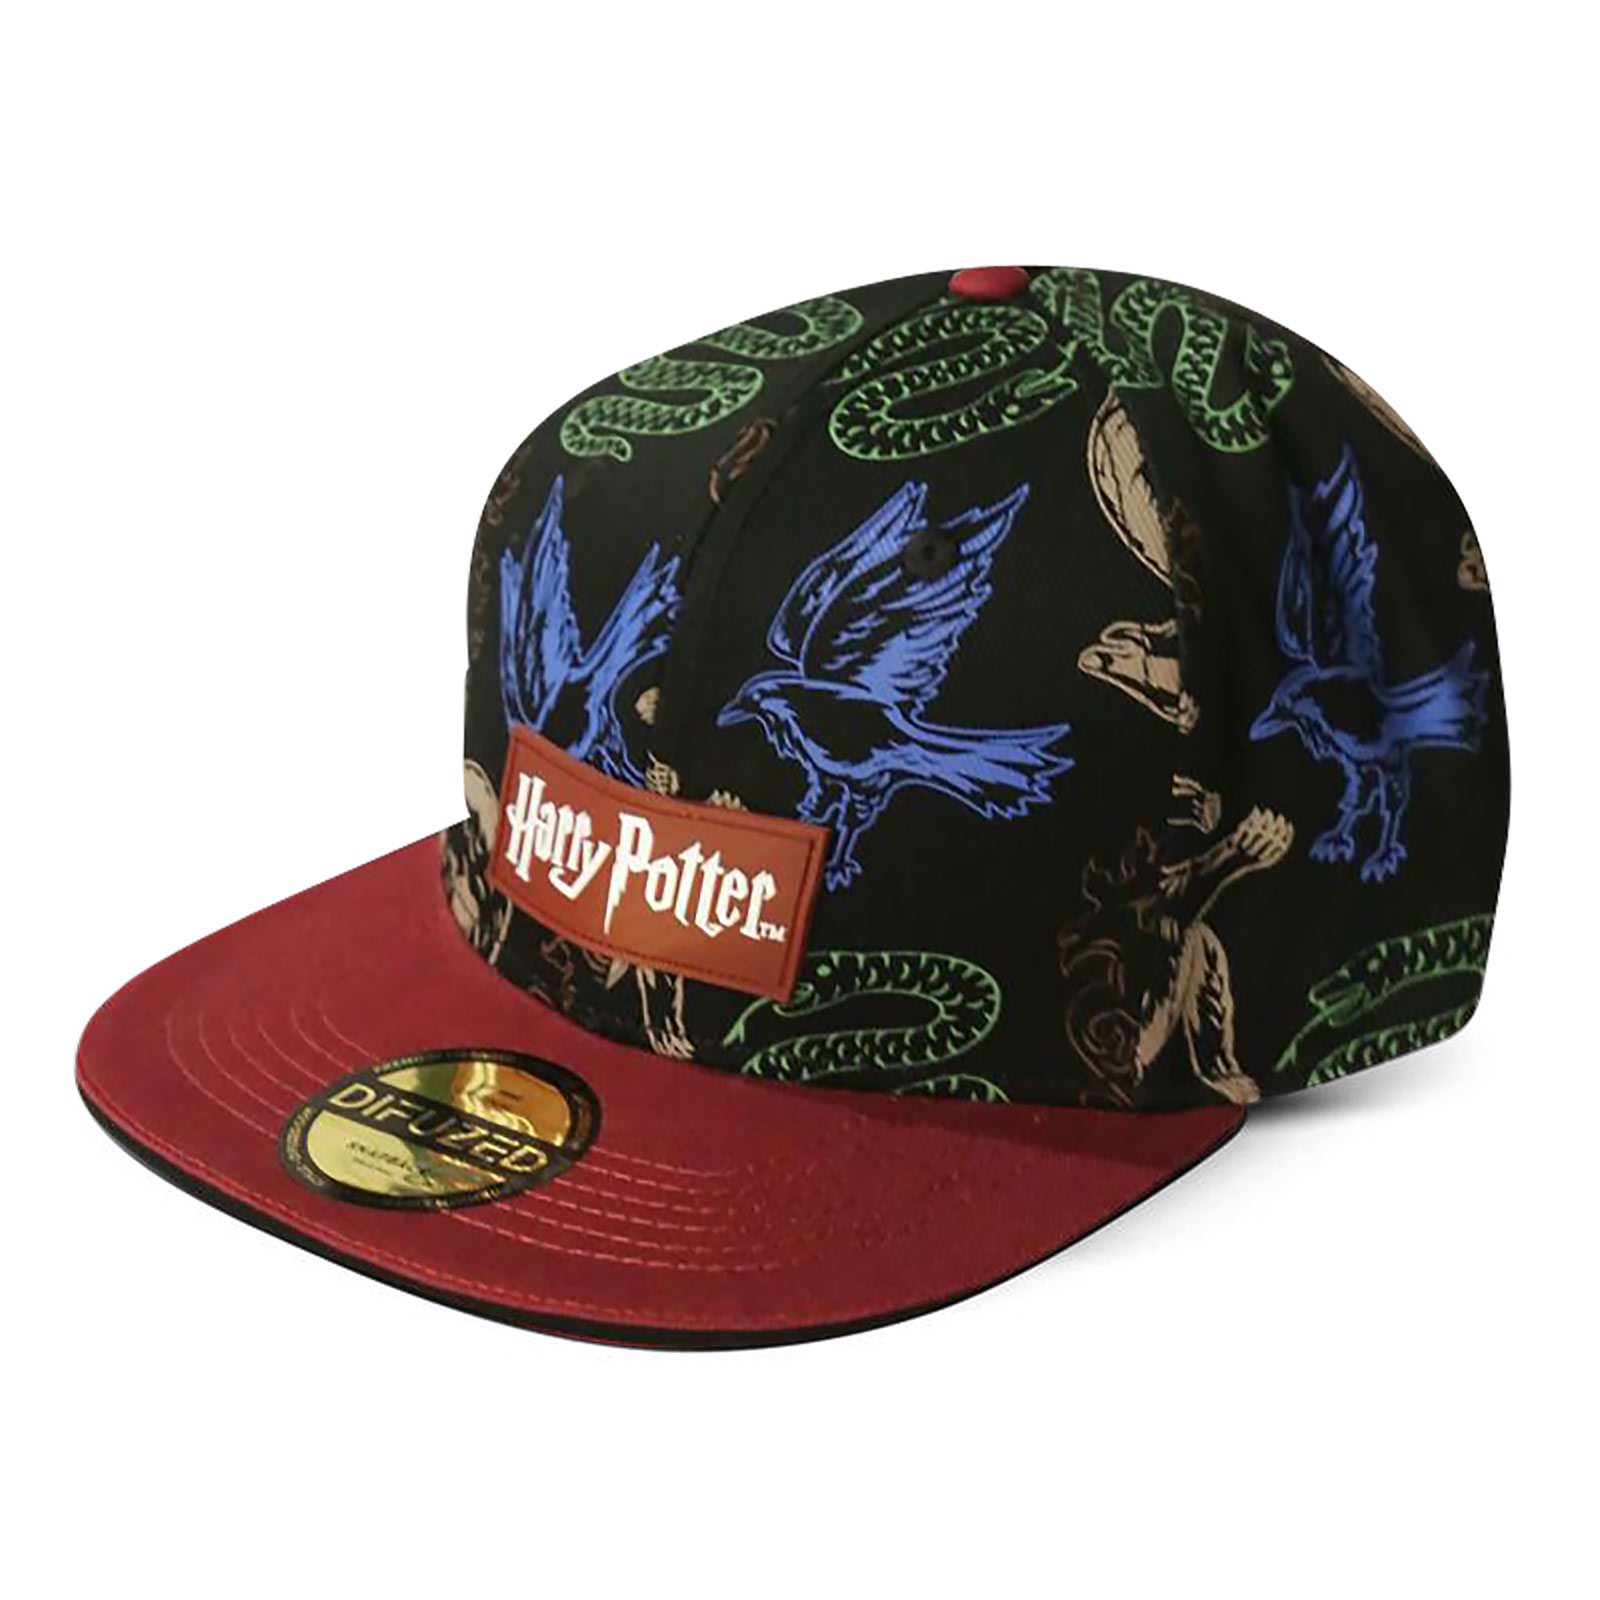 Harry Potter - Hogwarts Wappentiere Snapback Cap